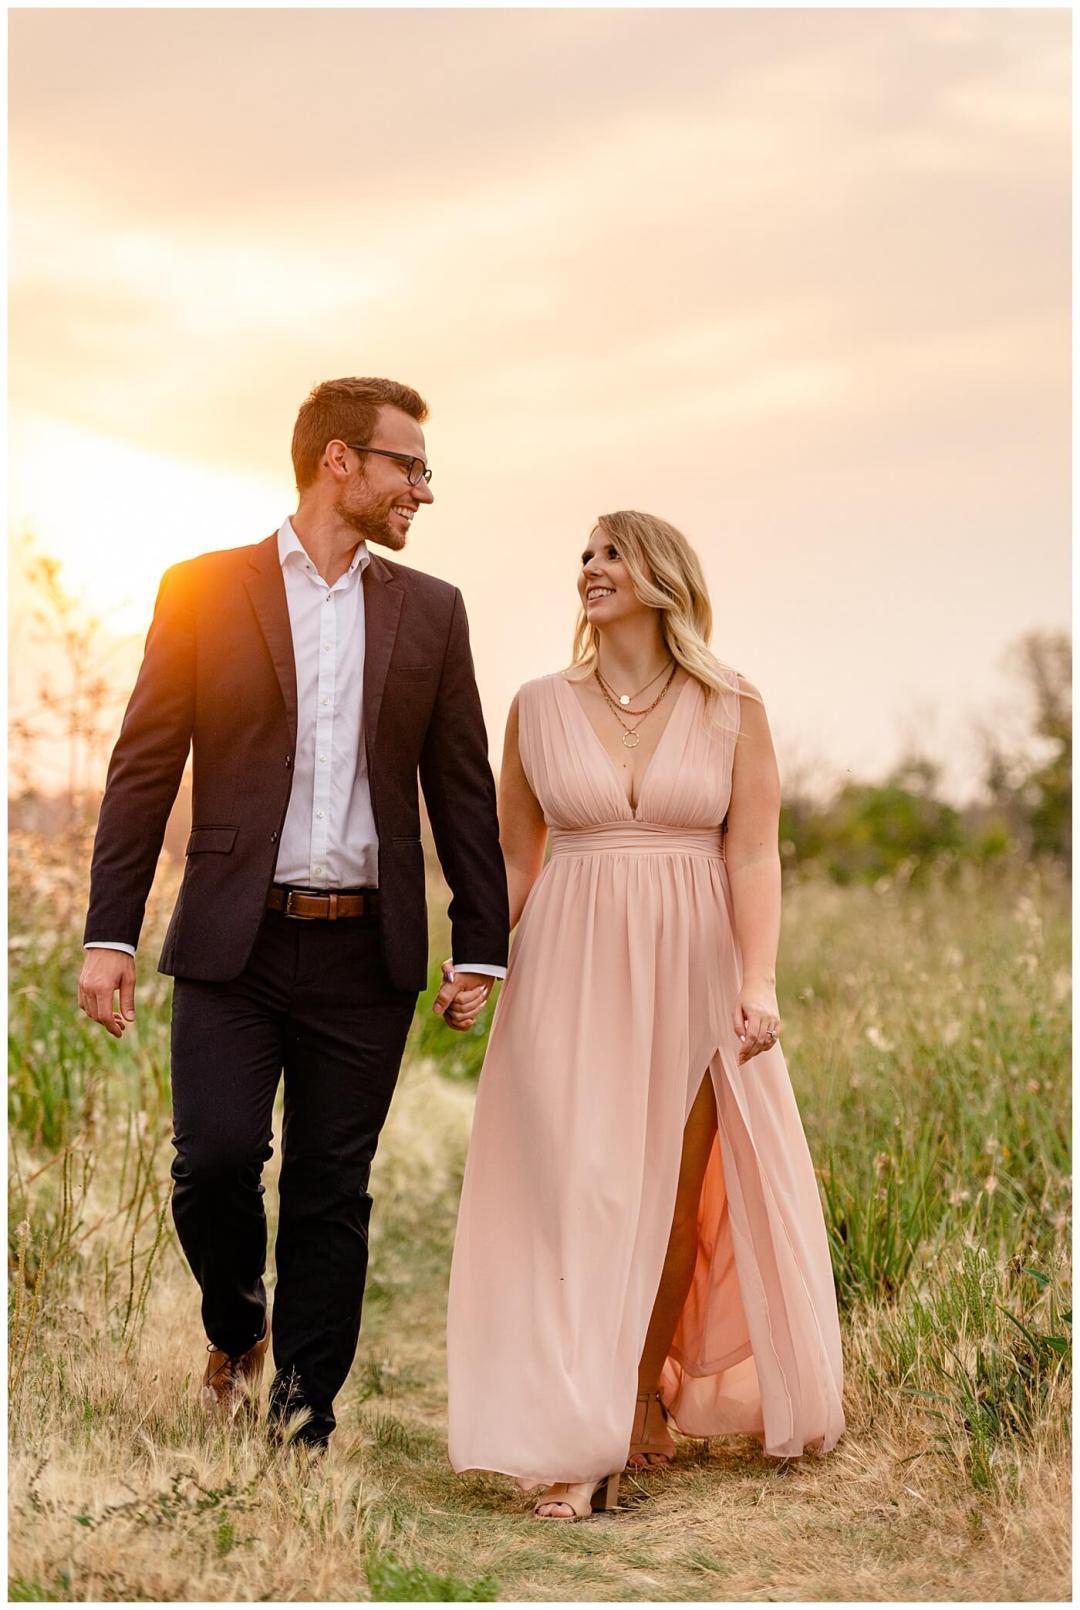 Regina Wedding Photographer - Natural Light Engagement Session in Douglas Park Regina - Couple walk along the path at sunset inside the Wascana Habitat Conservation Area